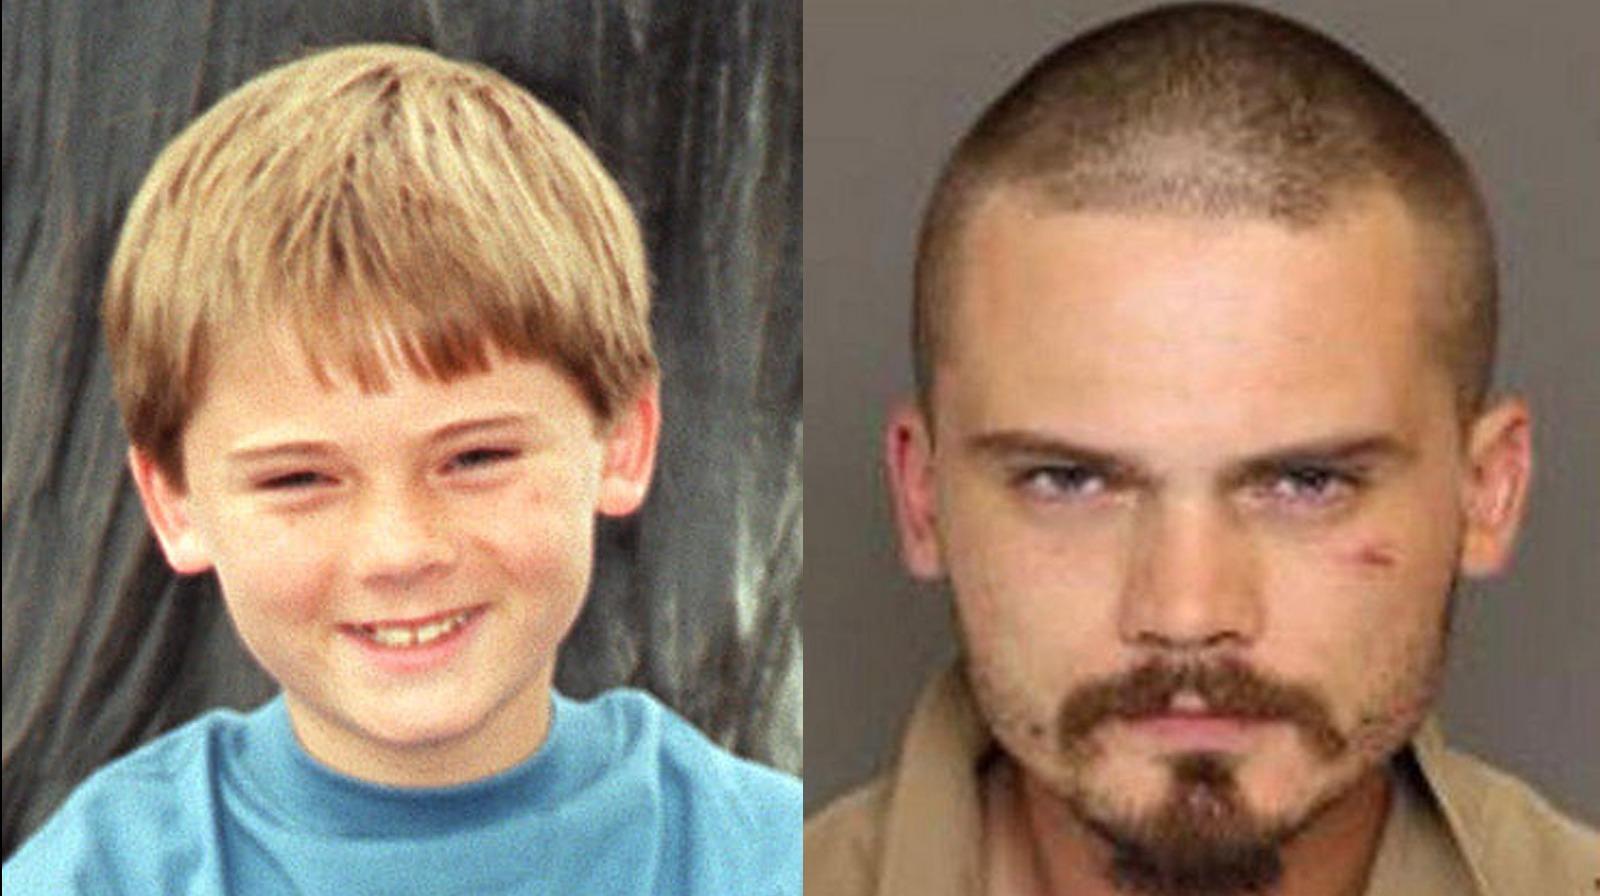 Star Wars Child Actor Jake Lloyd In Jail After High Speed